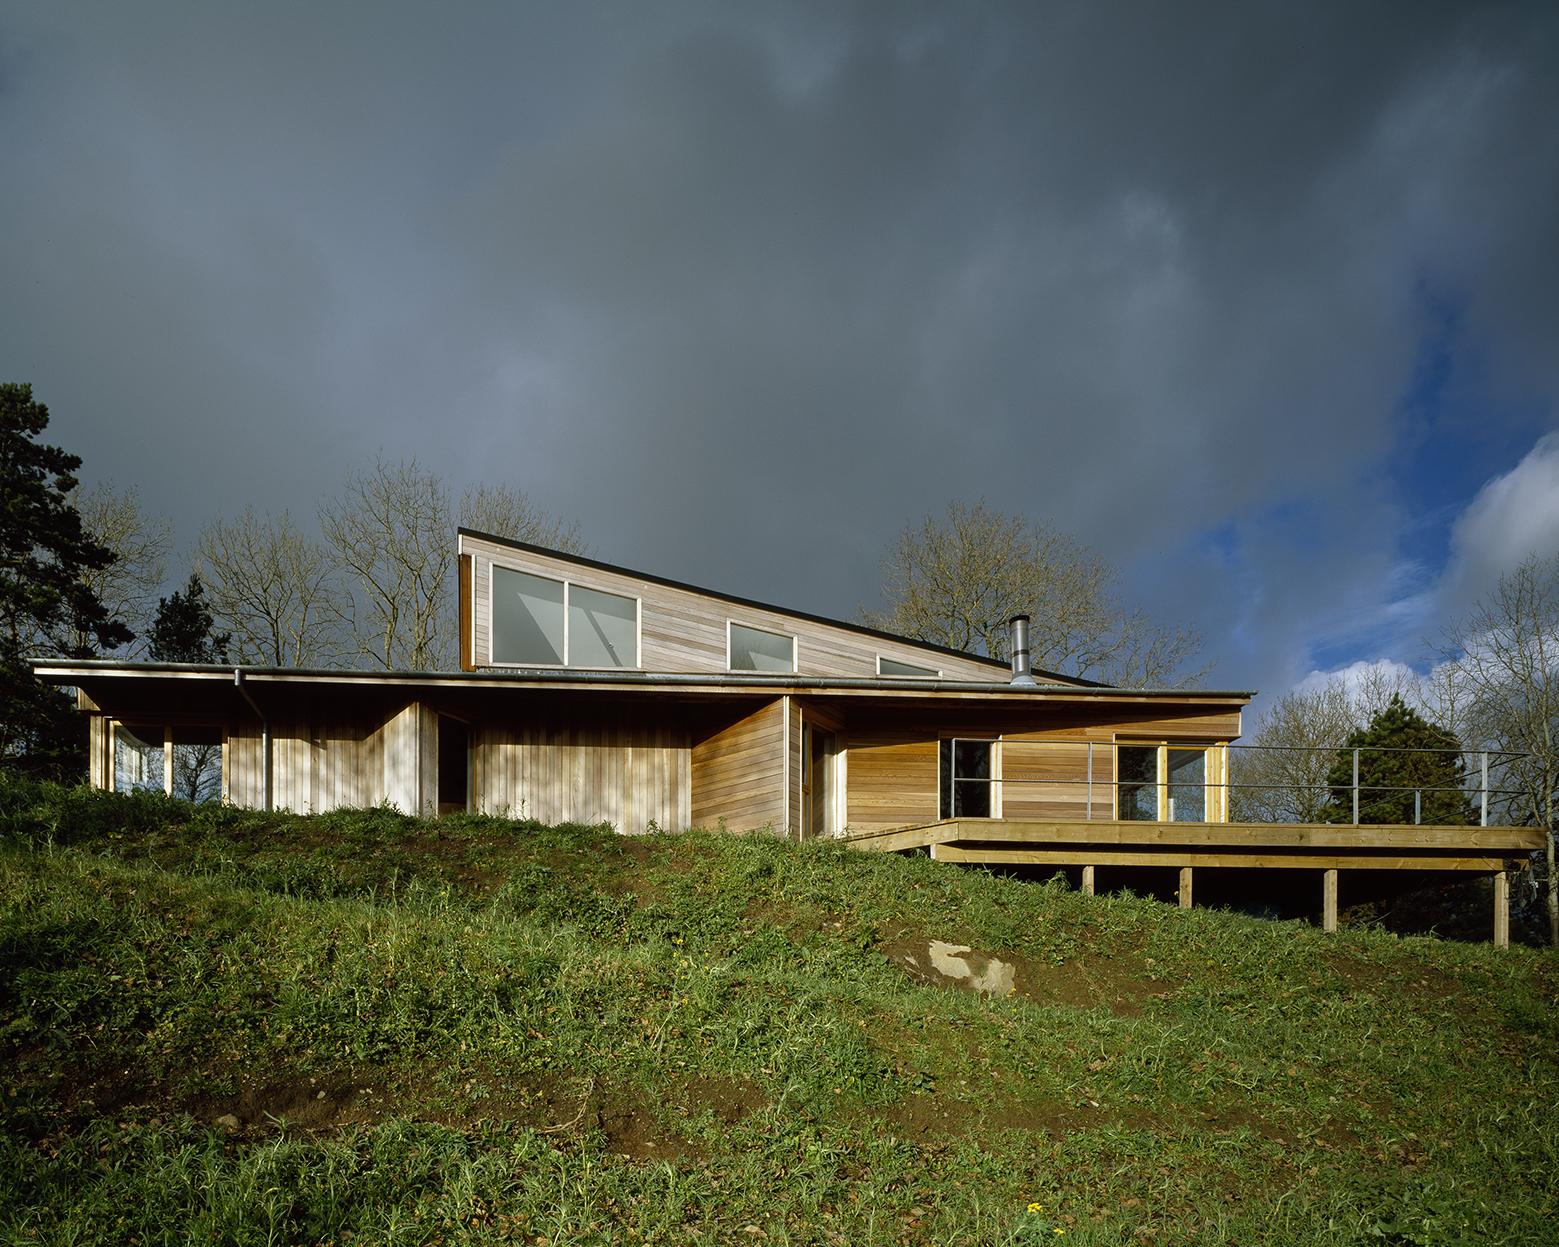 Casa Carton Levert de Macgabhann Architects